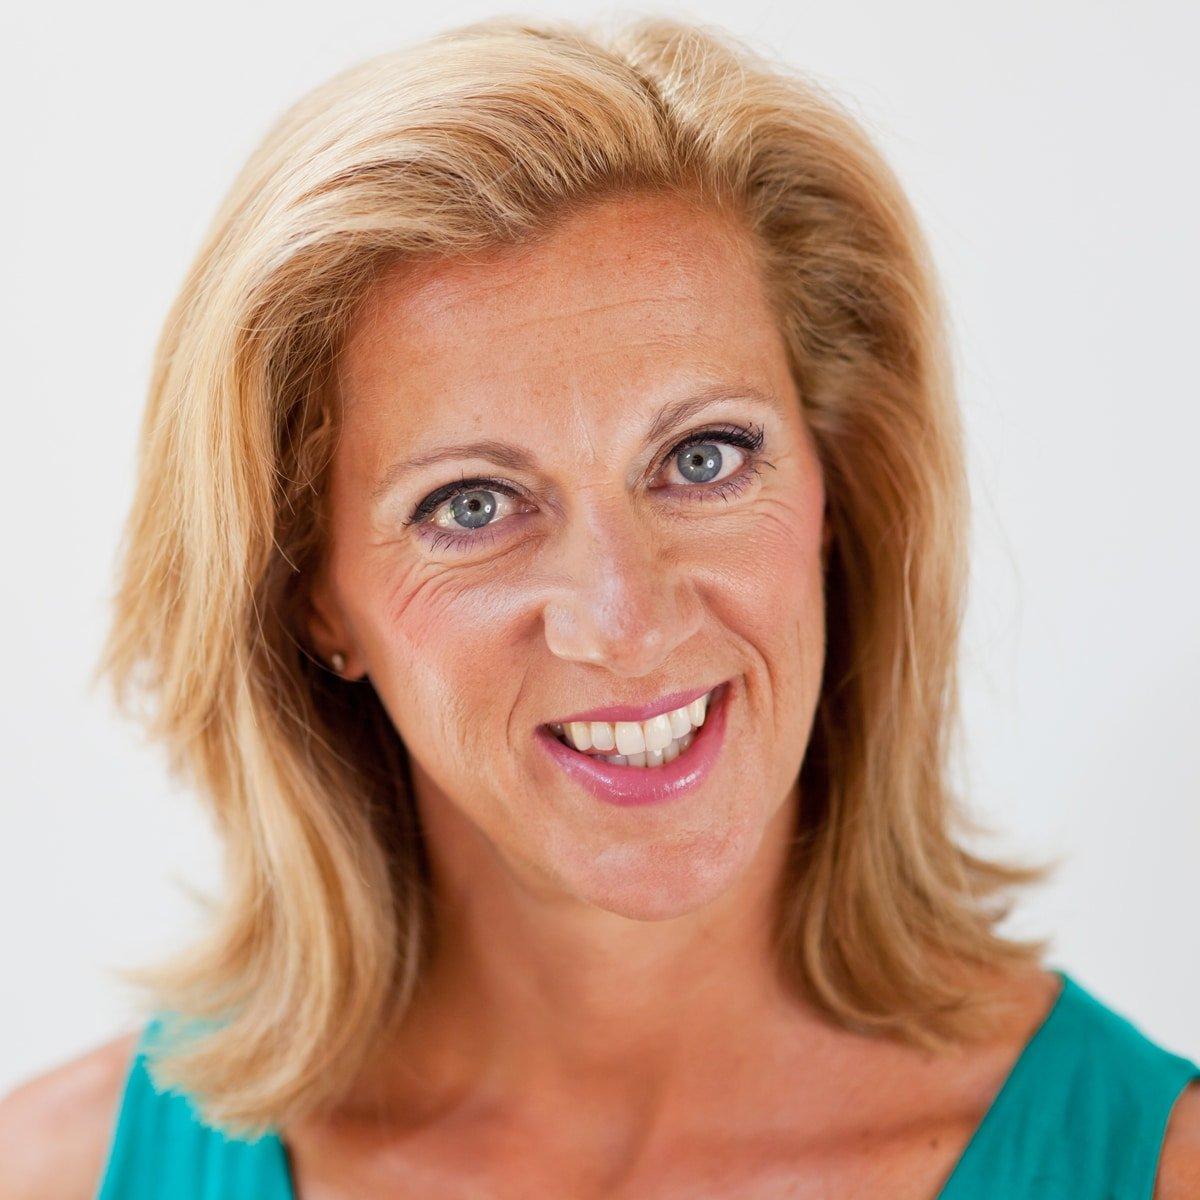 Sally-Gunnell-GB-400m-hurdler-Olympic-Gold-Medal-World-Champion-motivational-inspirational-speaker-at-Great-British-Speakers